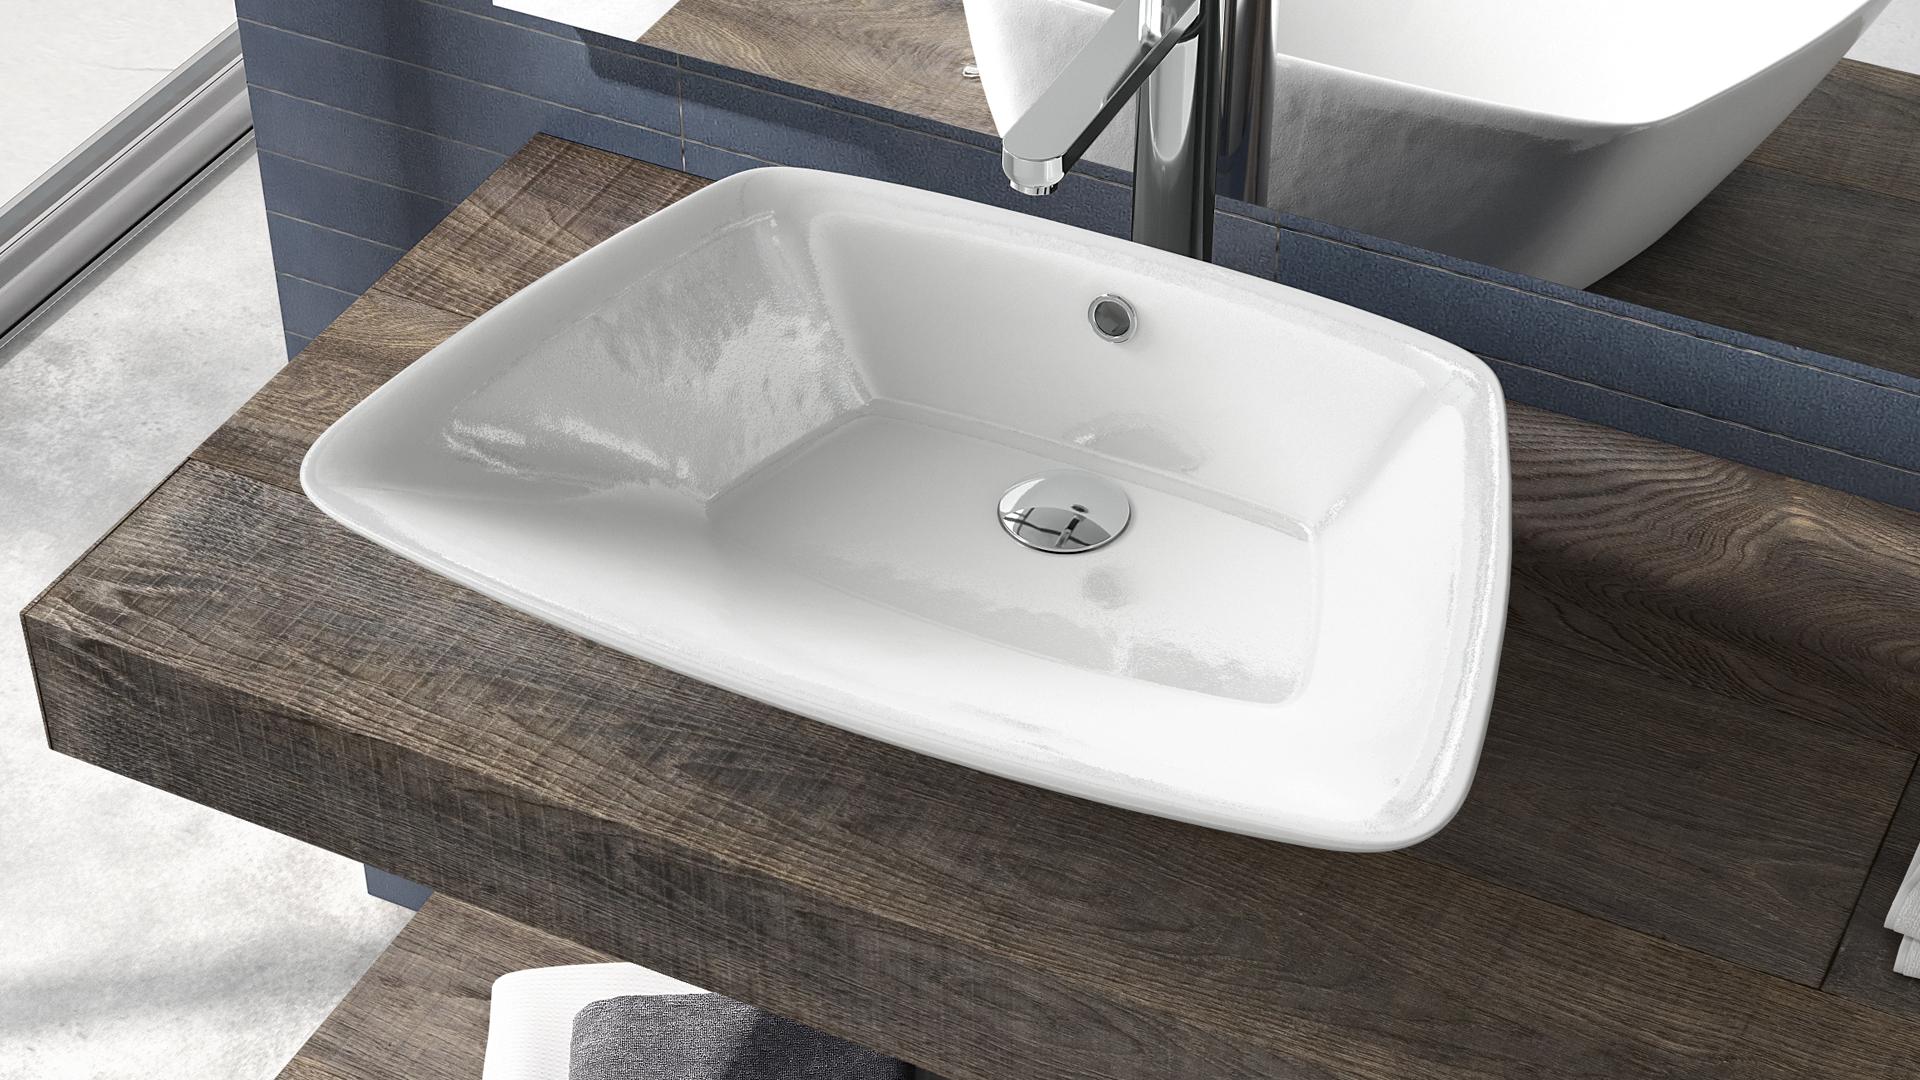 Pulizia del lavandino in ceramica: guida passo passo